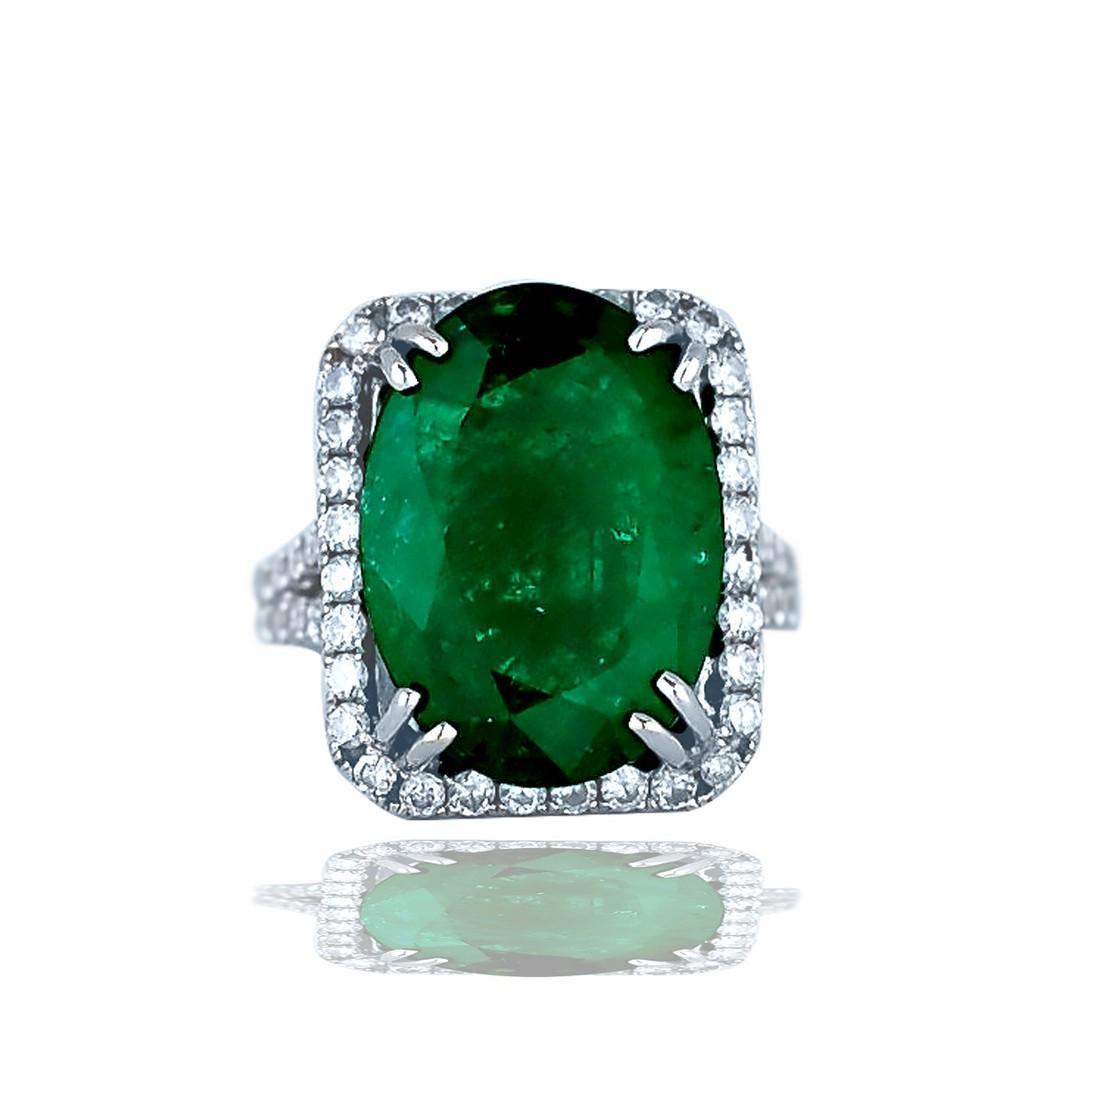 Over 11.5 Ct. Natural Emerald set over 1 carat